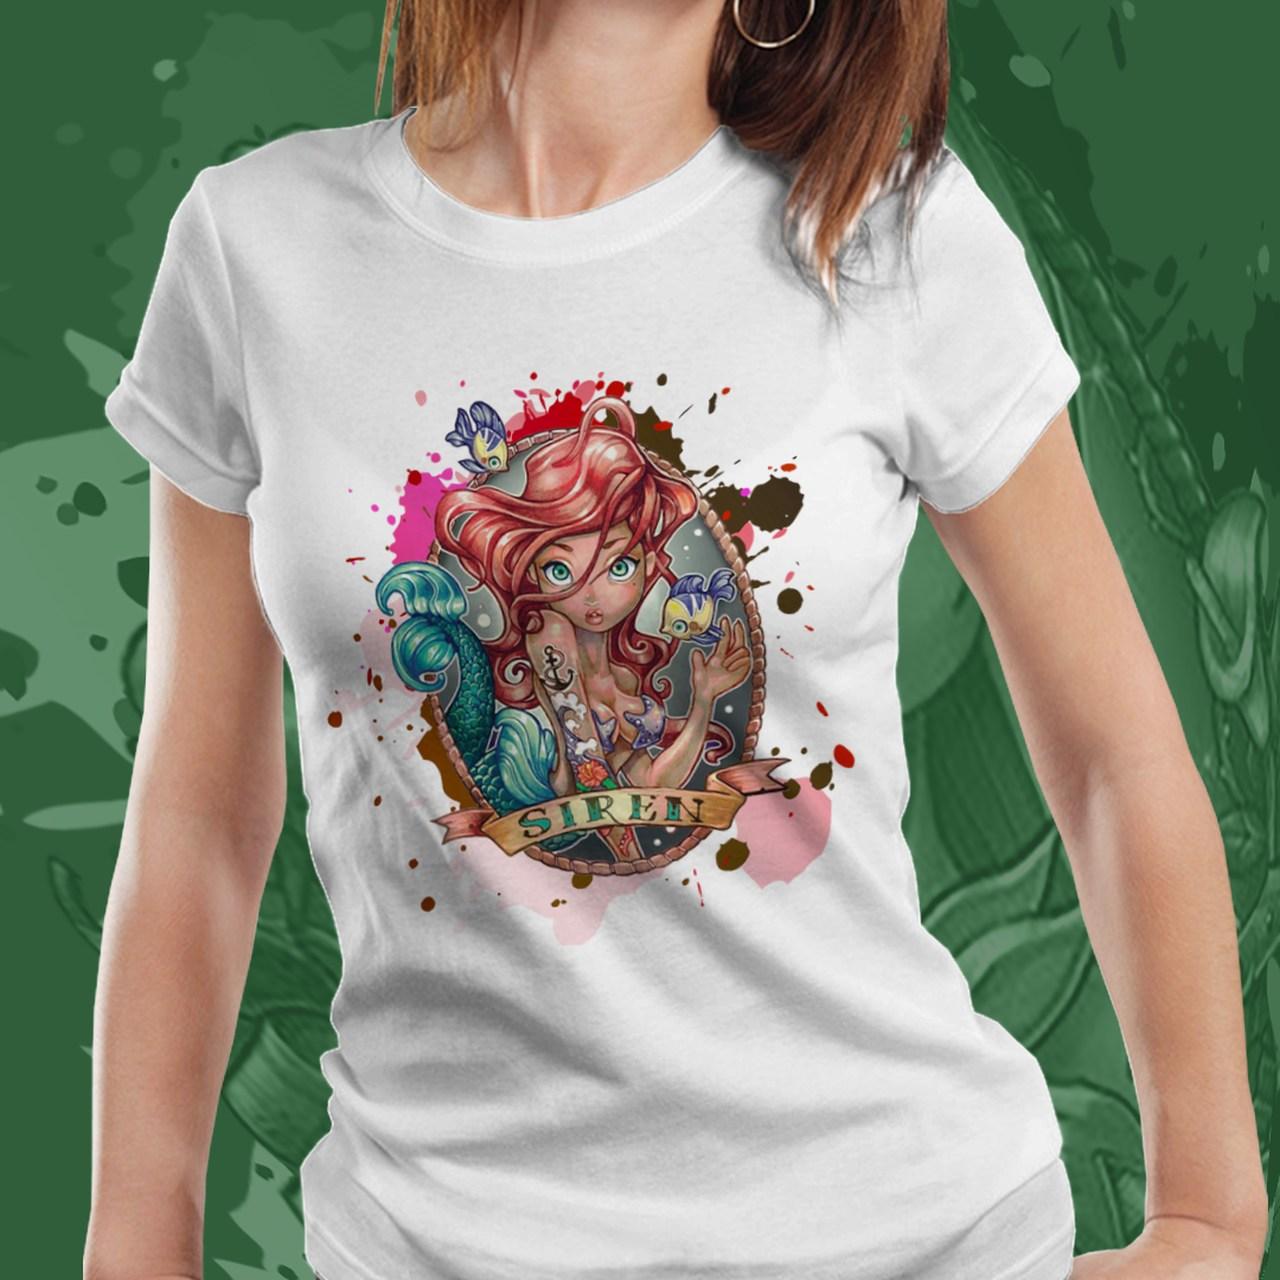 Camiseta Feminina Ariel: Princesa Ariel - Disney (Branco) - EV